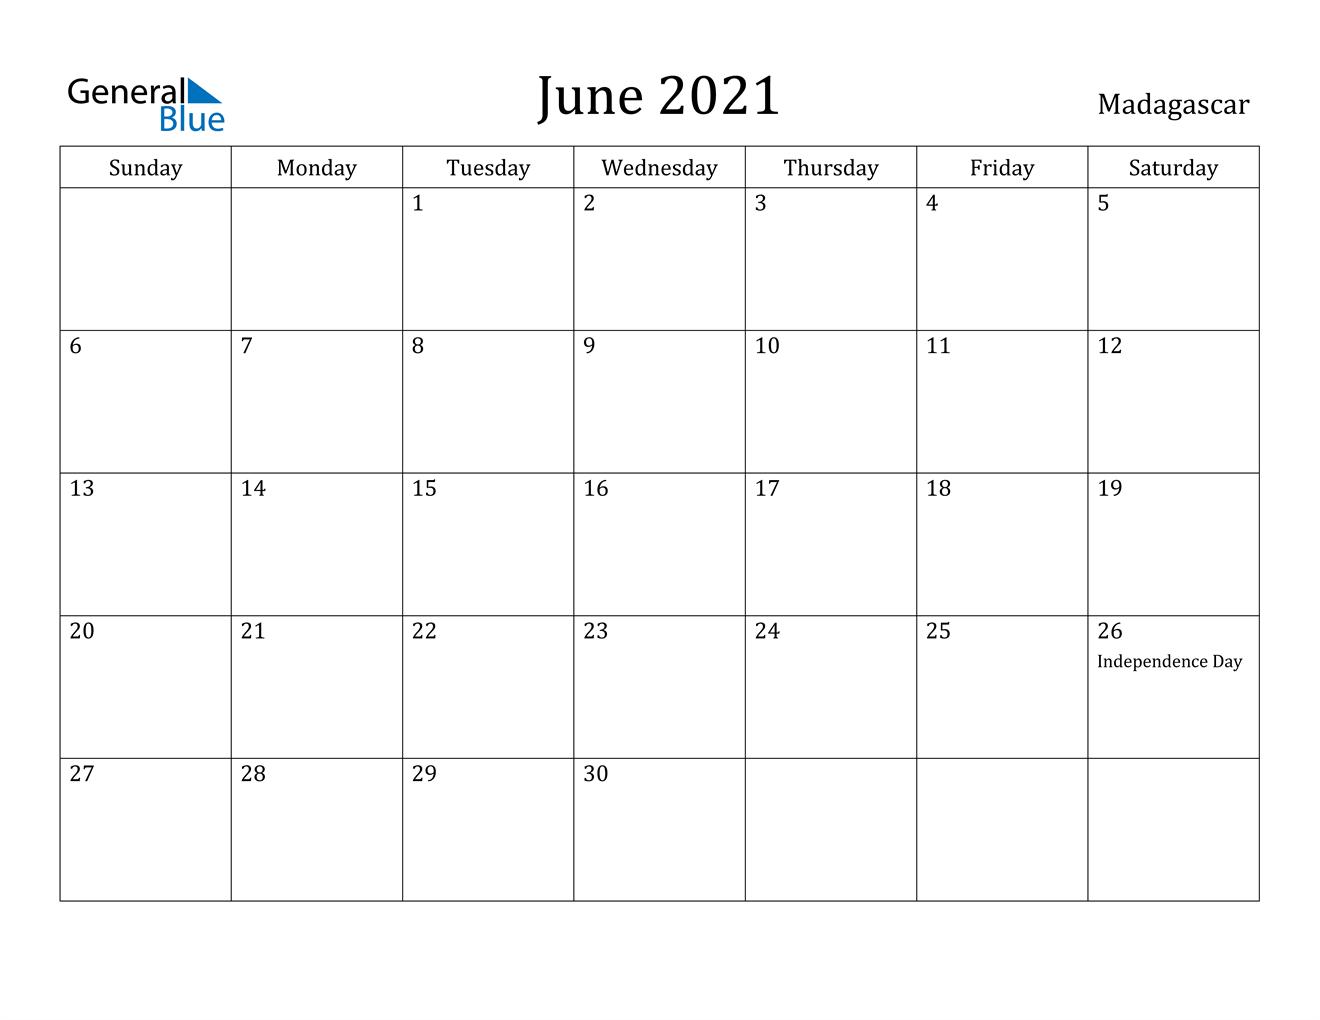 June 2021 Calendar - Madagascar